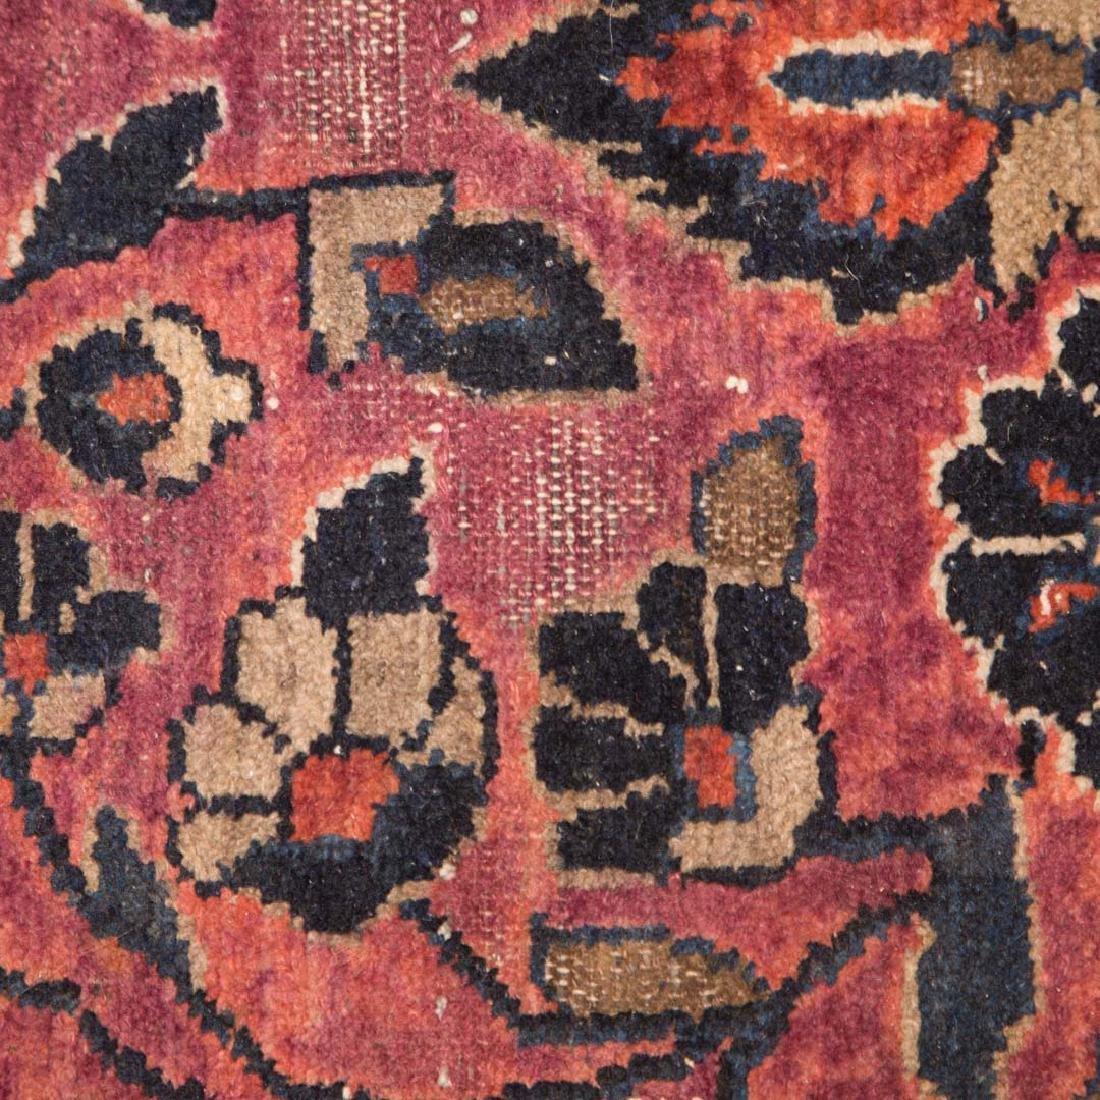 Antique Lilehan rug, approx. 5.5 x 7.3 - 4